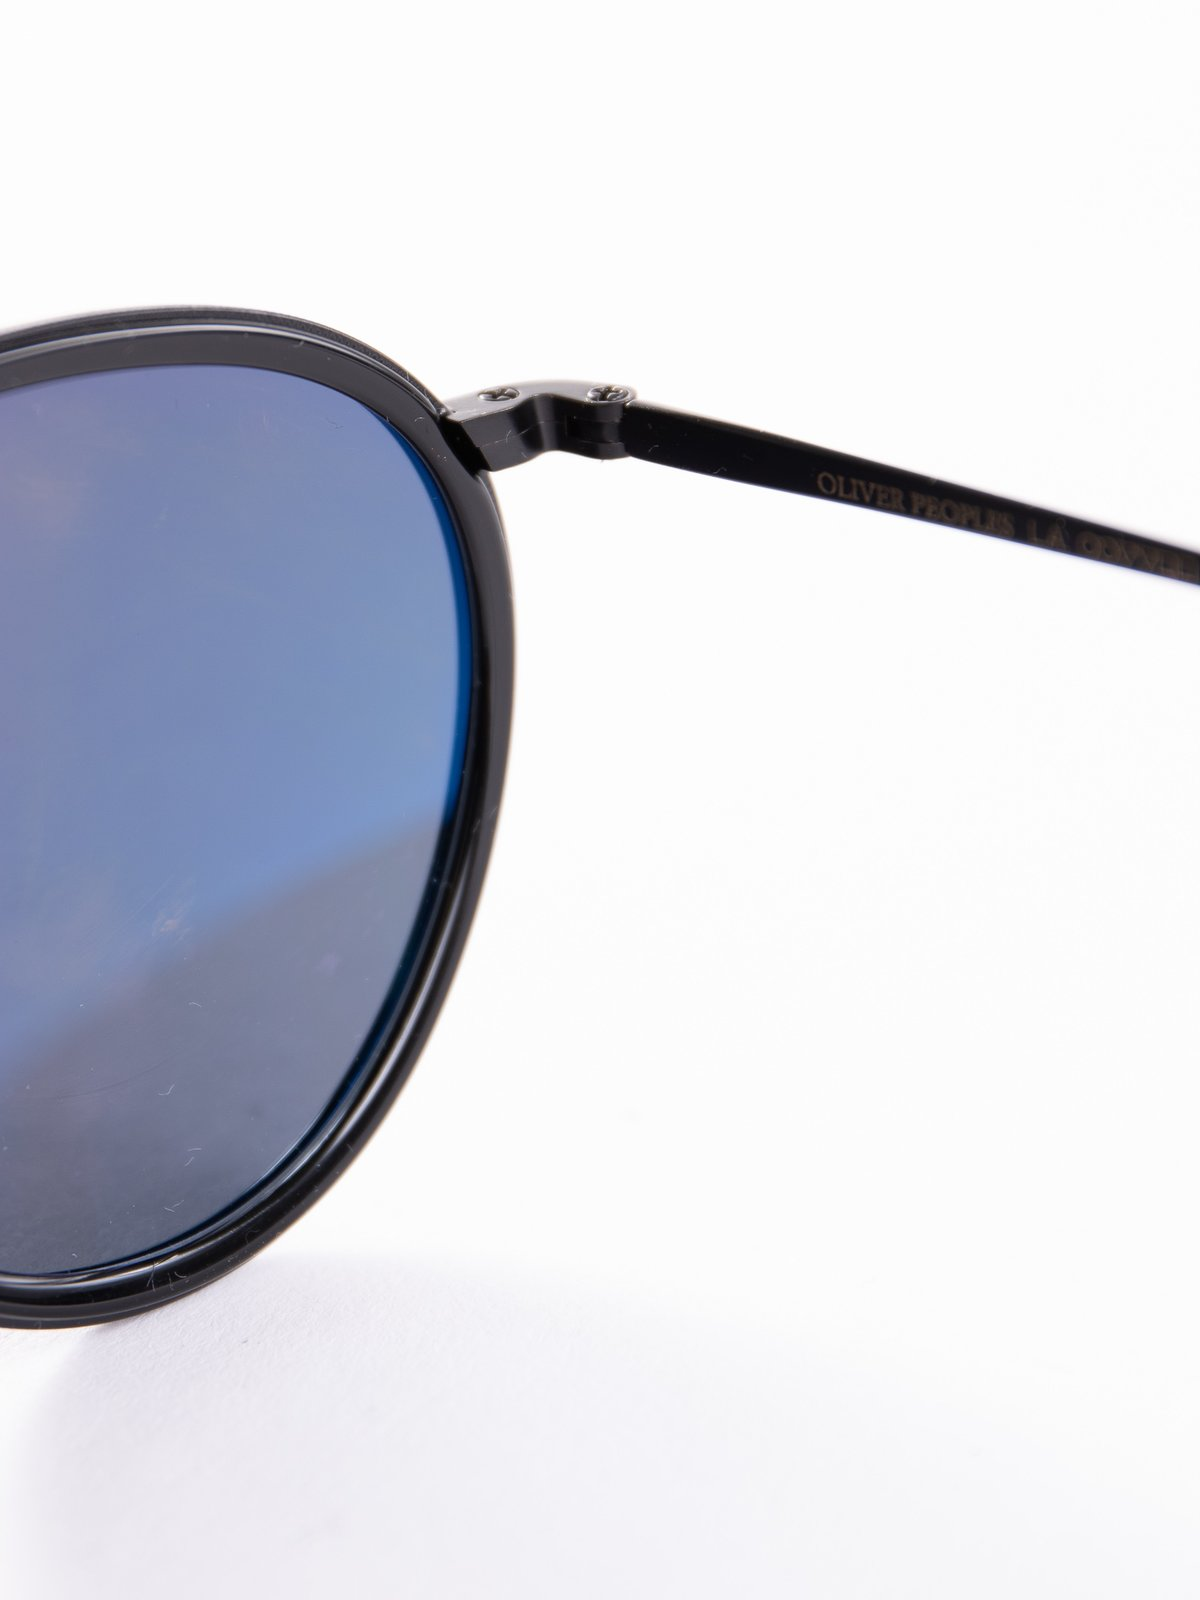 Black–Matte Black/Blue MP–2 Sunglasses - Image 4